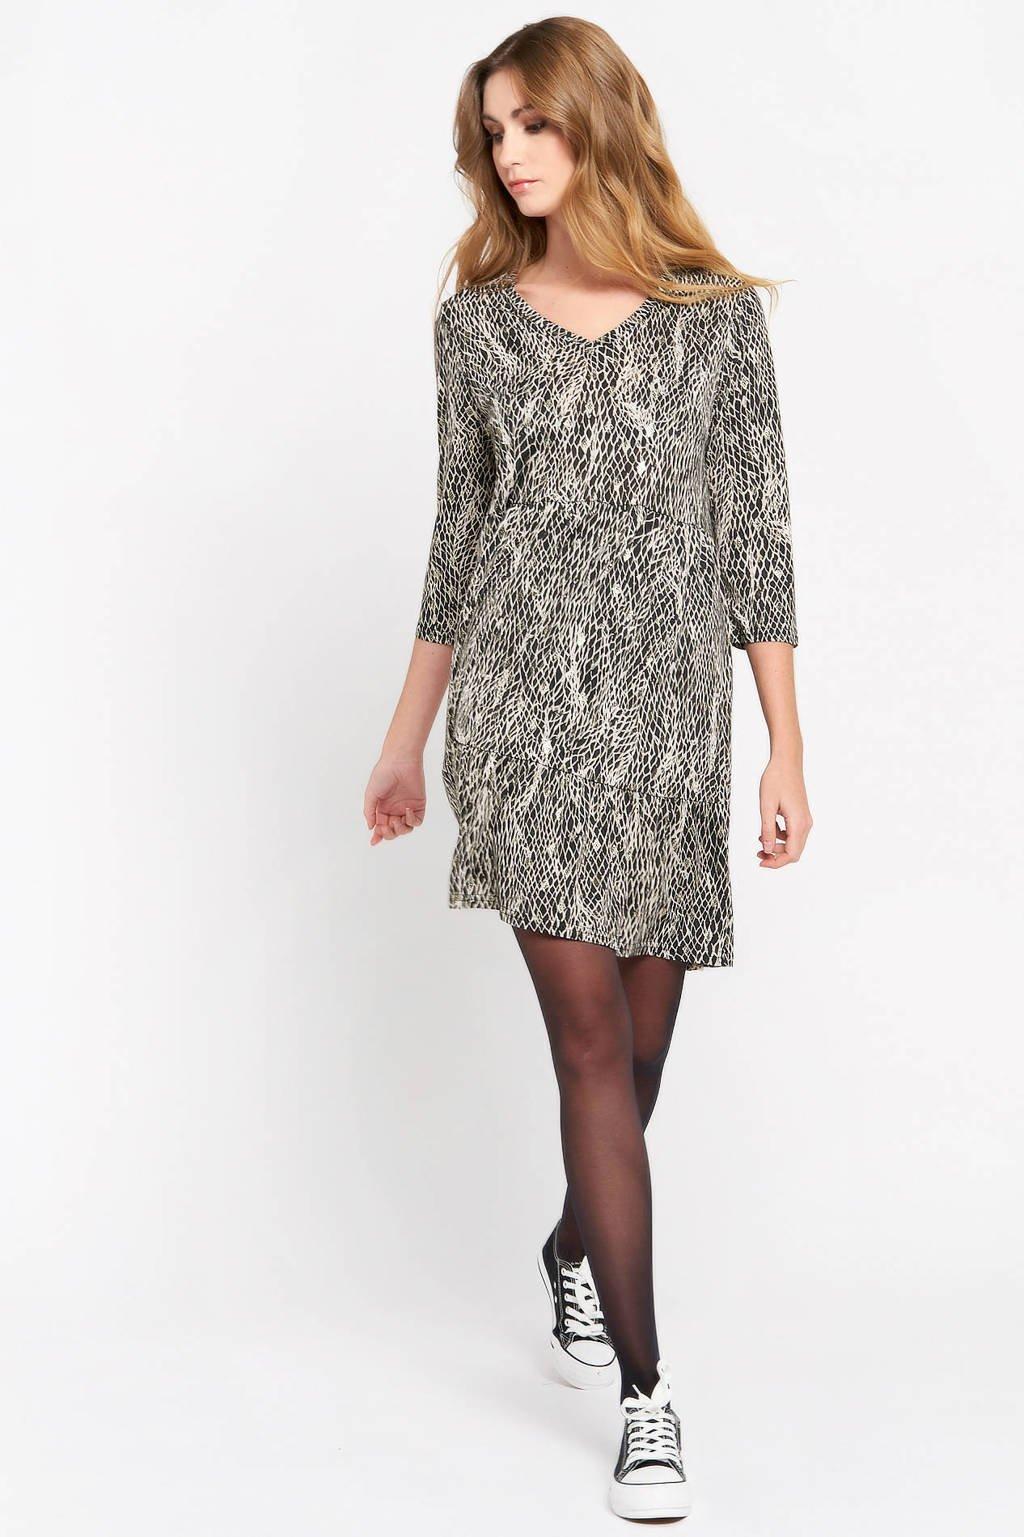 LOLALIZA jurk met dierenprint zwart/wit, Zwart/wit